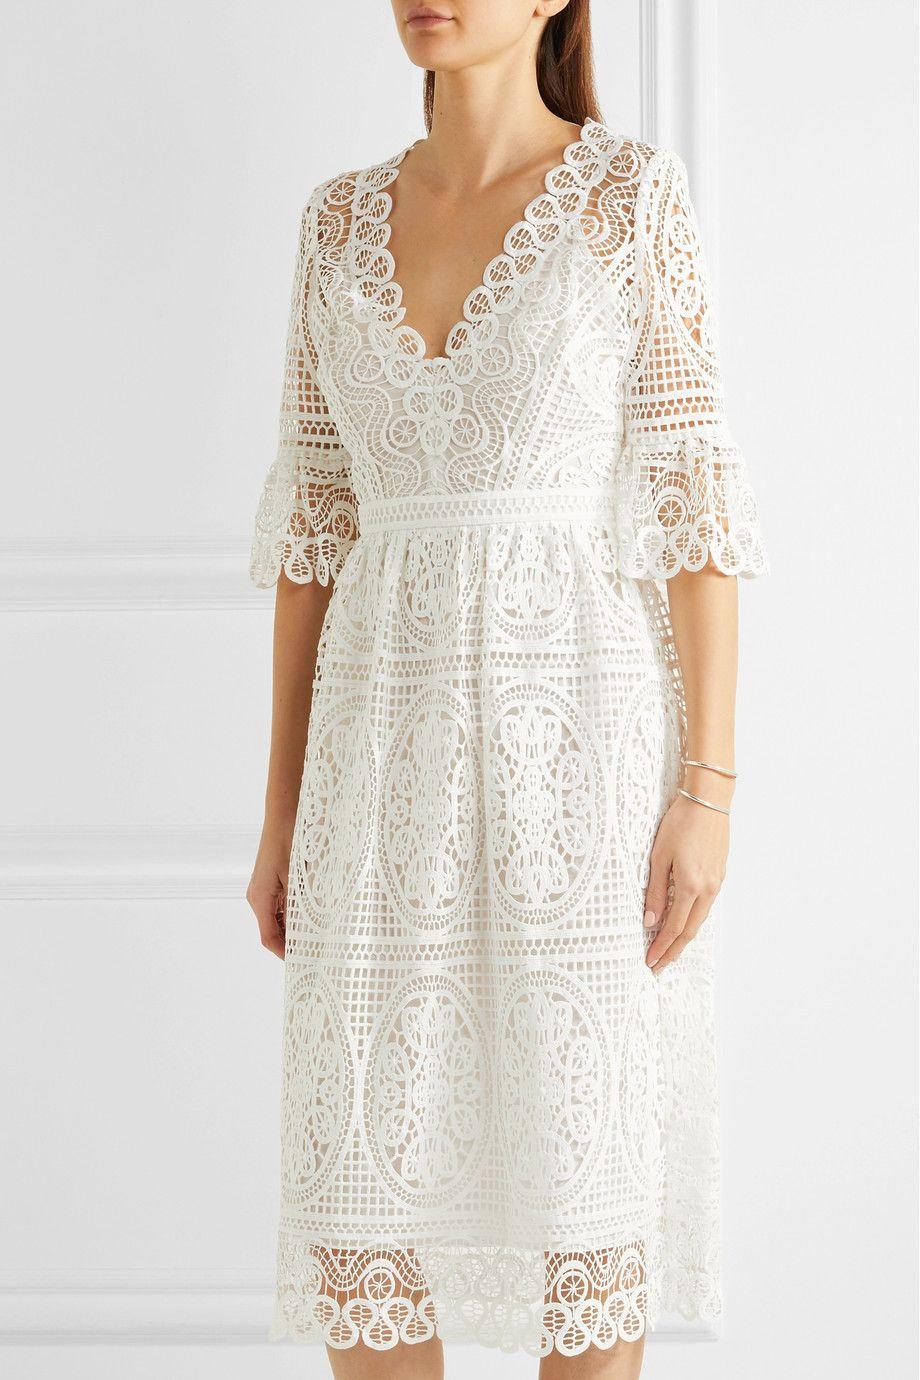 Temperley London - Titania guipure cotton-lace midi dress